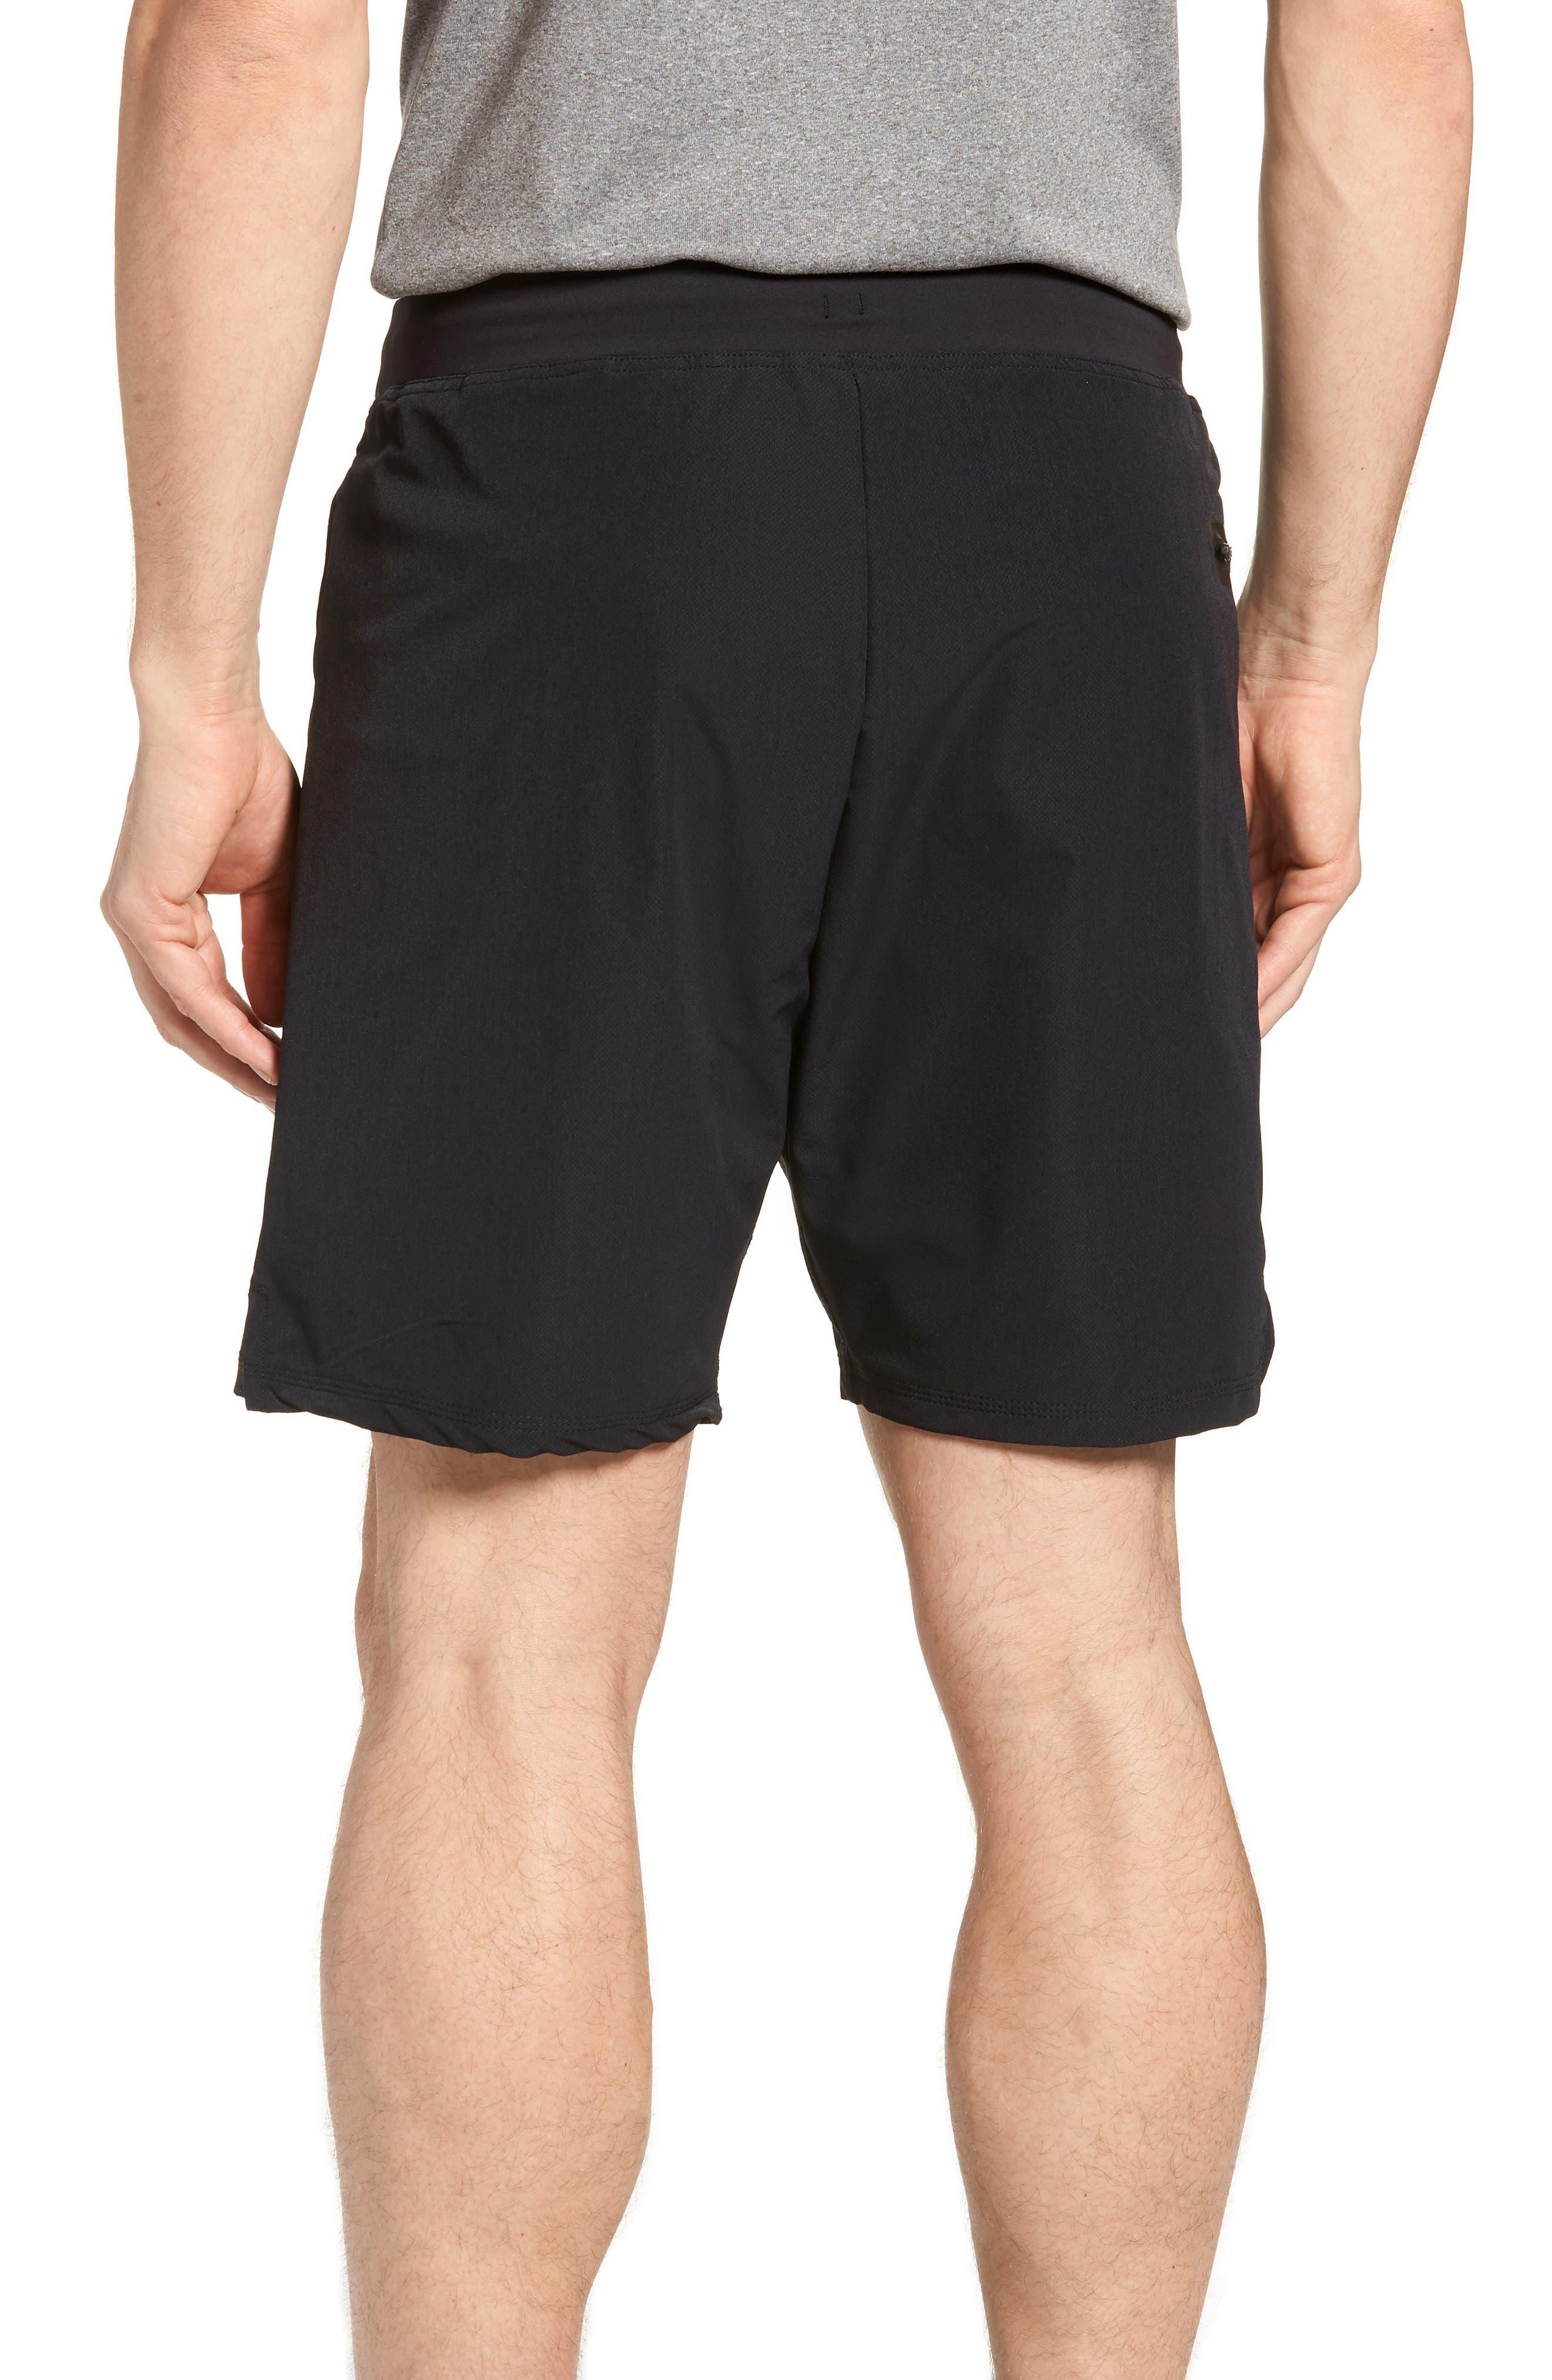 ZANEROBE Type 1 Shorts,                             Alternate thumbnail 2, color,                             Black